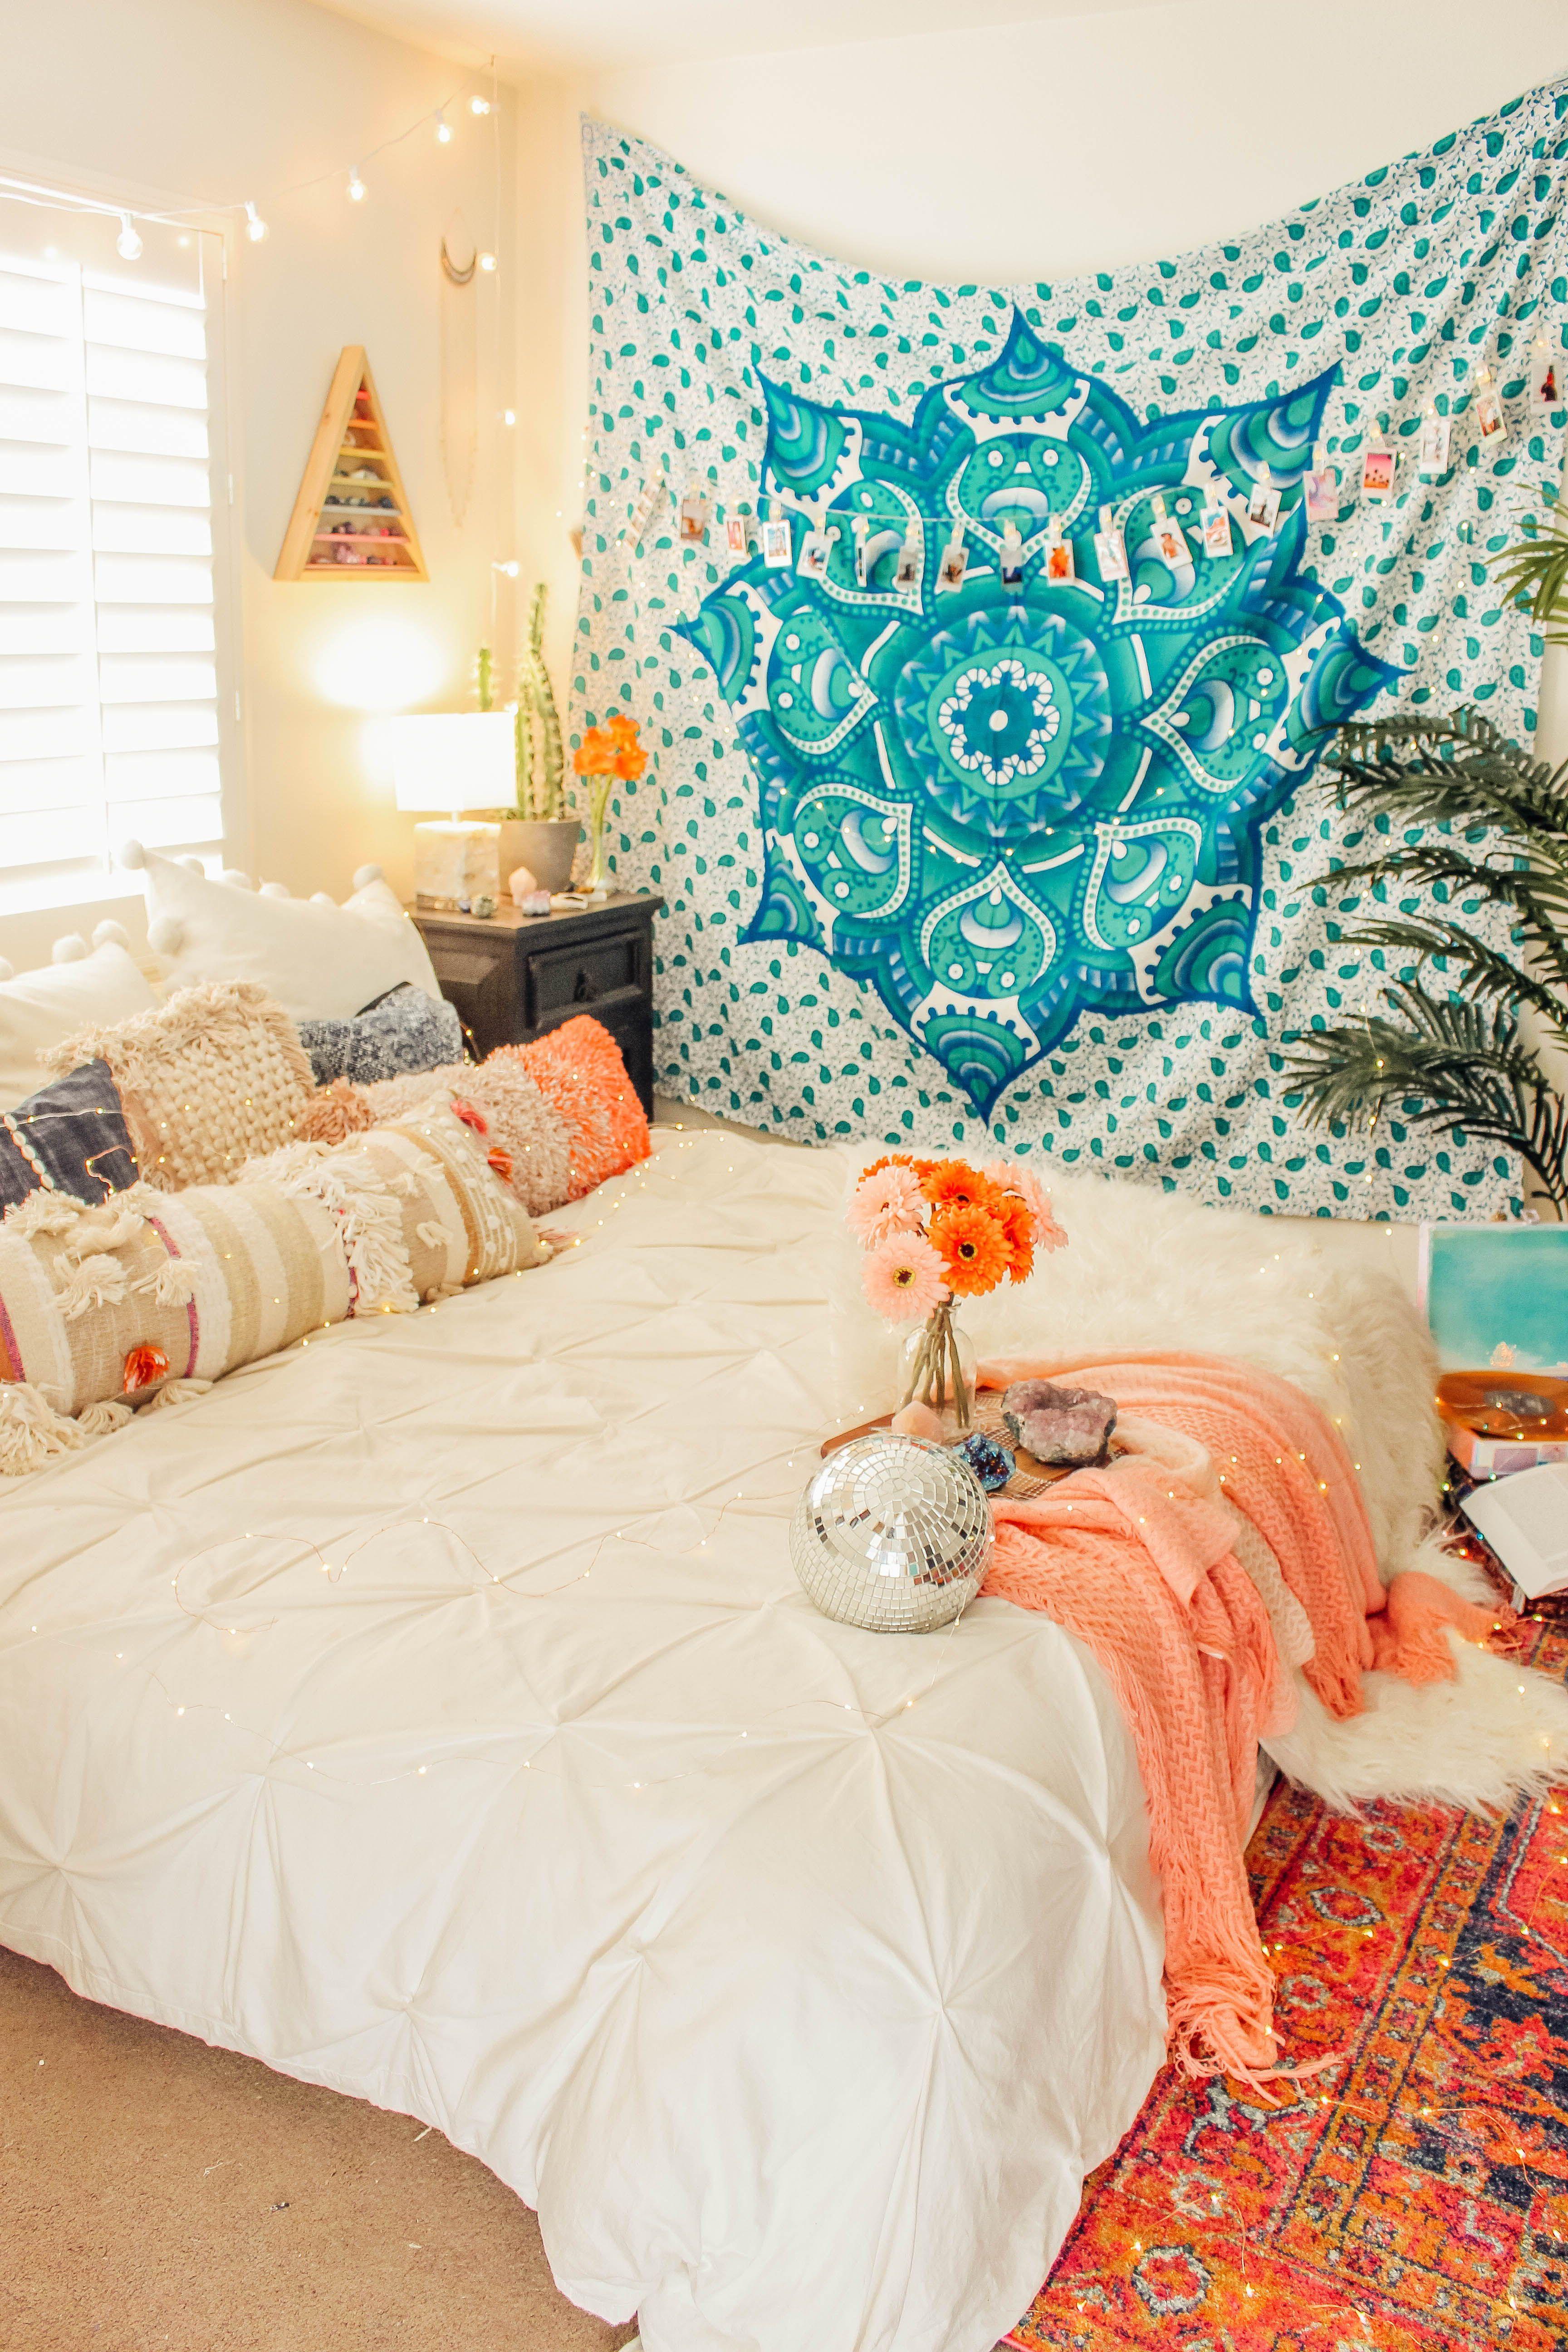 P I N T E R E S T Maggie875 Bohemian Style Decor Bedroom Room Ideas Bedroom Bed Decor